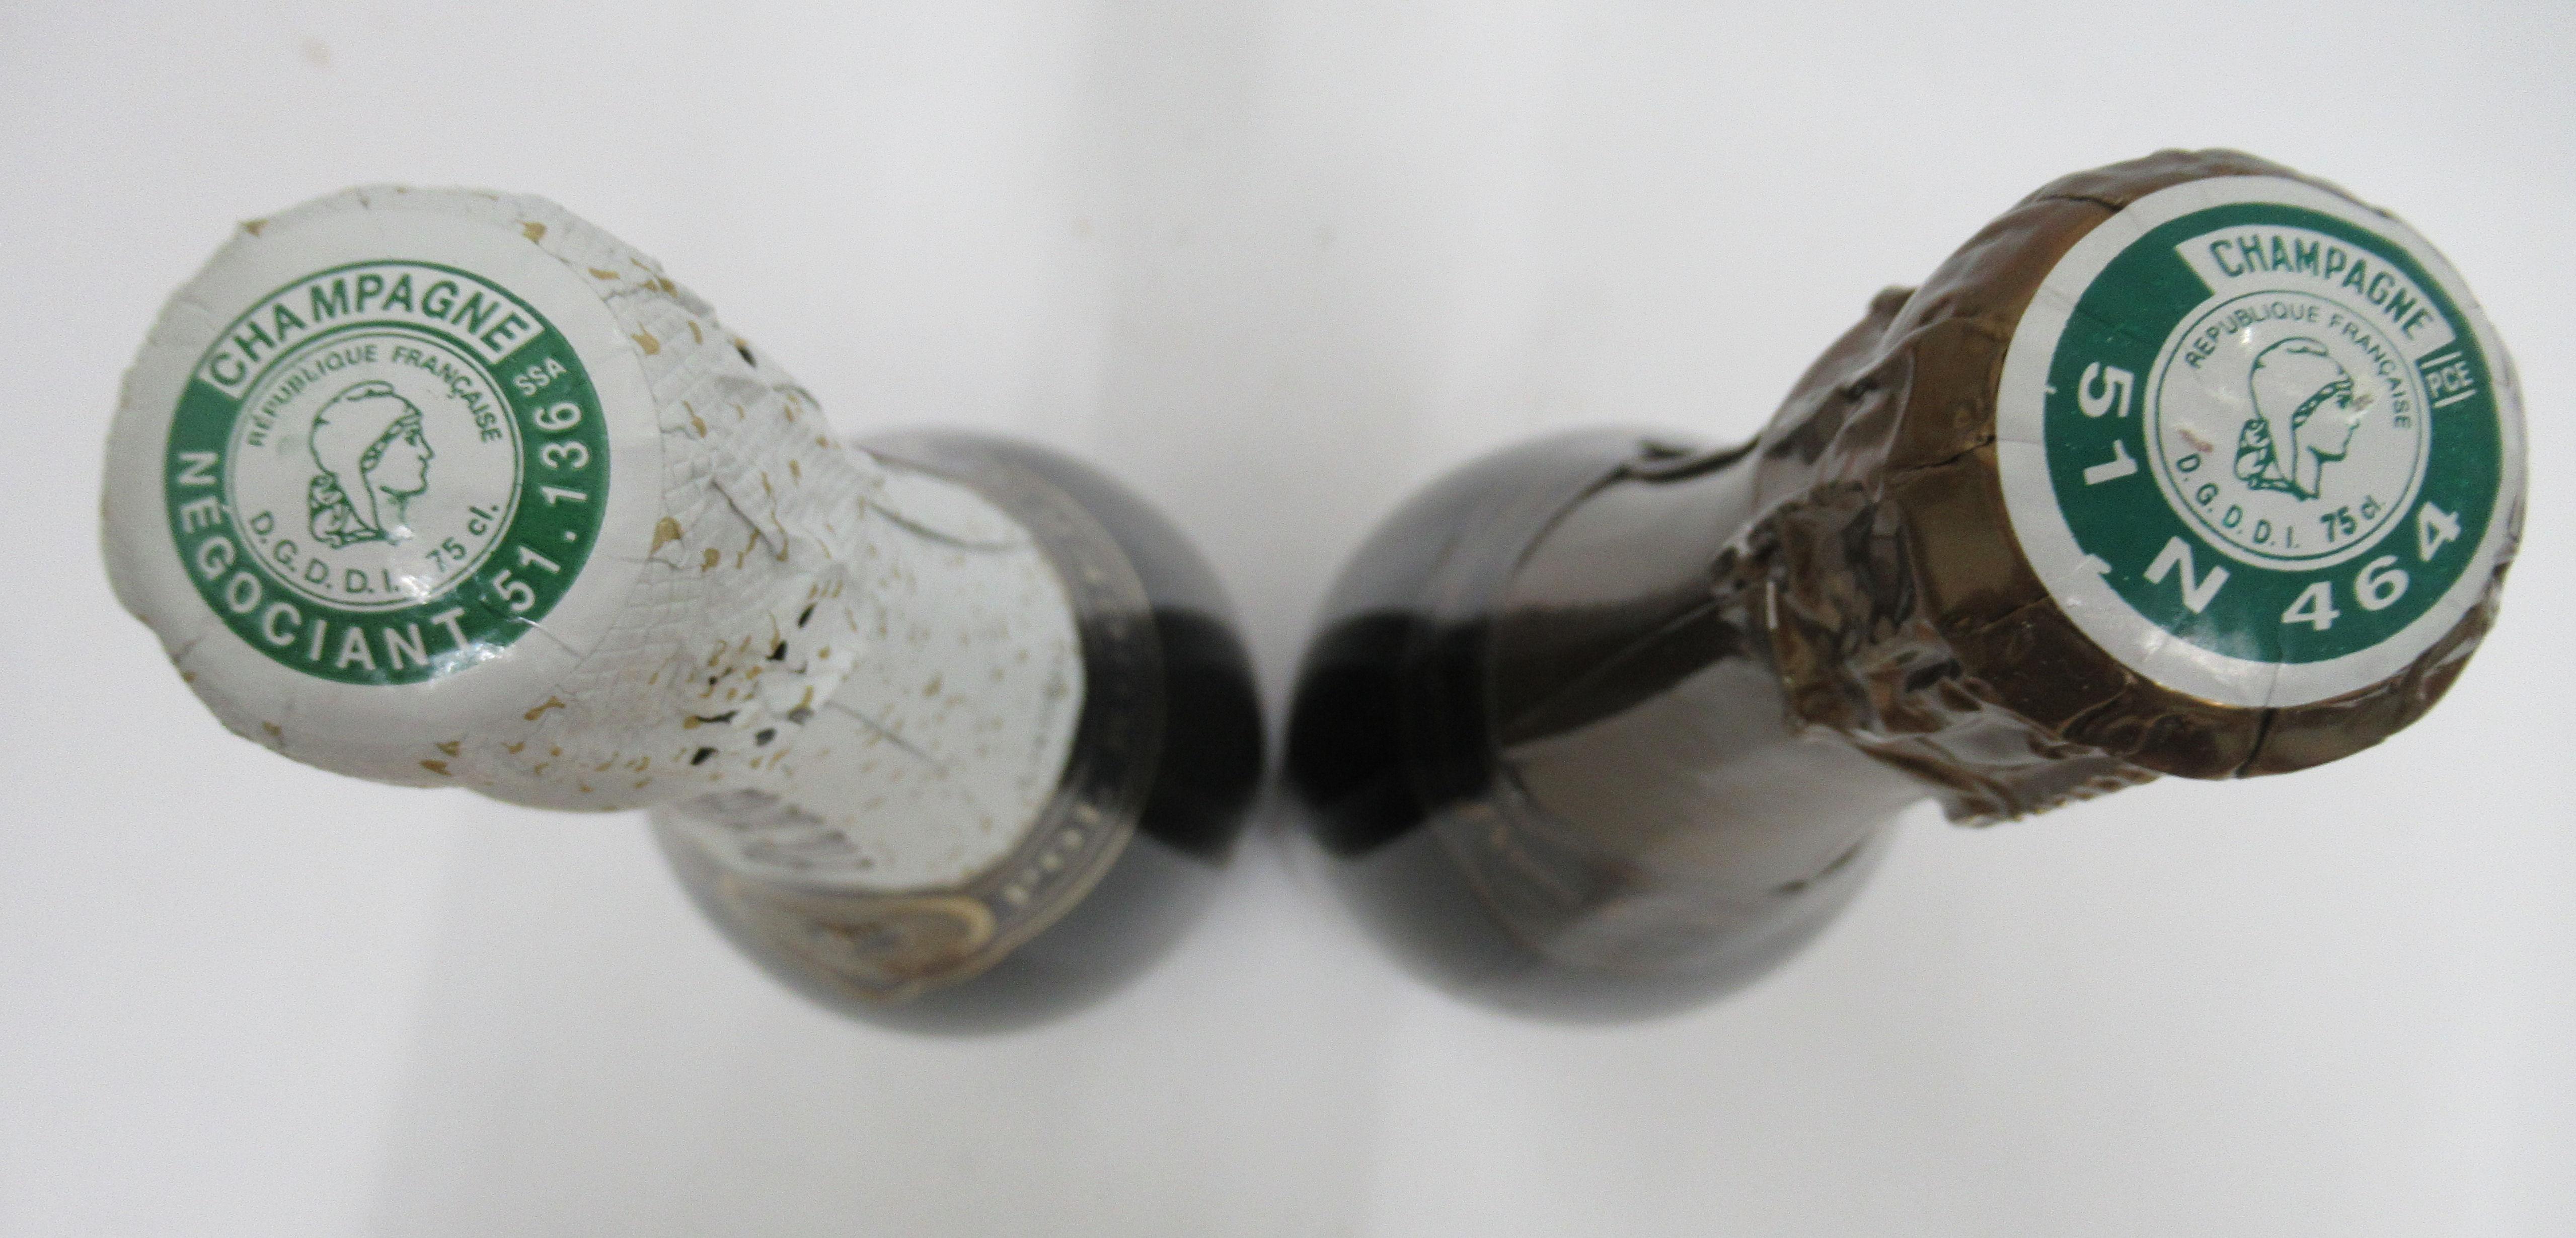 Wine, Champagne, viz. a Pol Roger; a Ruinart Blanc de Blancs; and a 1996 Bruno Paillard each boxed - Image 6 of 6